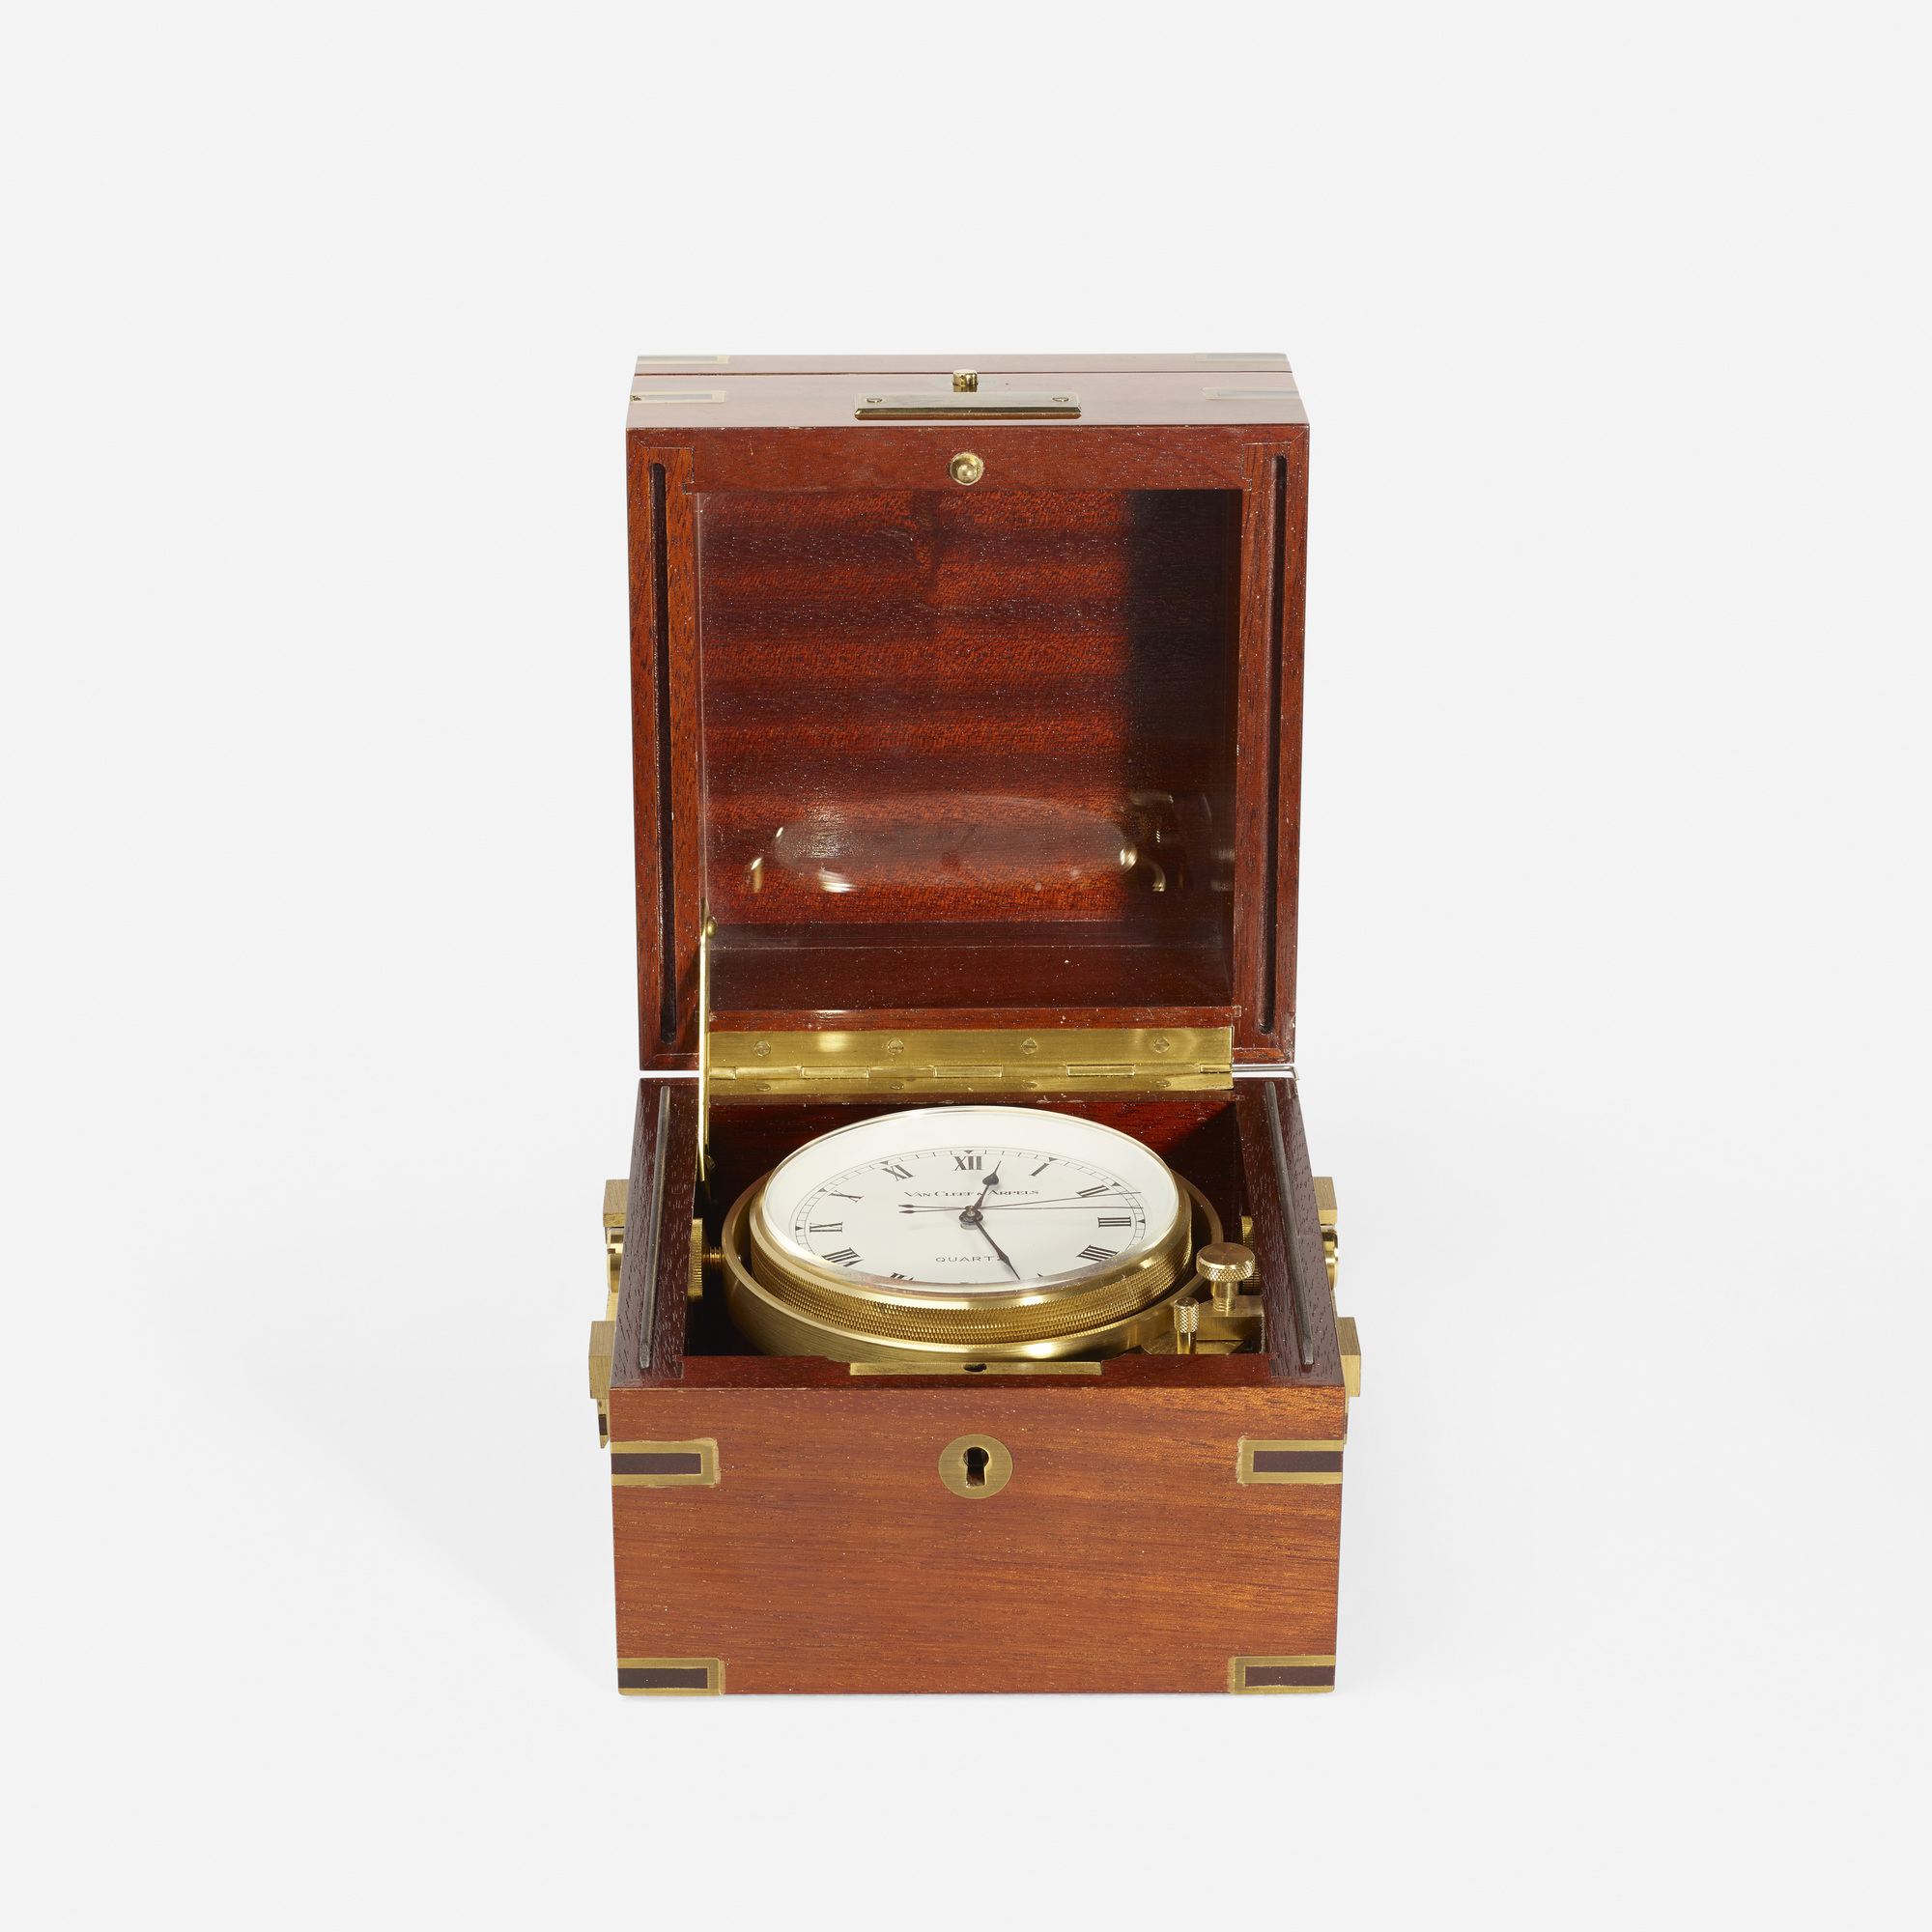 137: Van Cleef & Arpels / A nautical table clock (2 of 2)